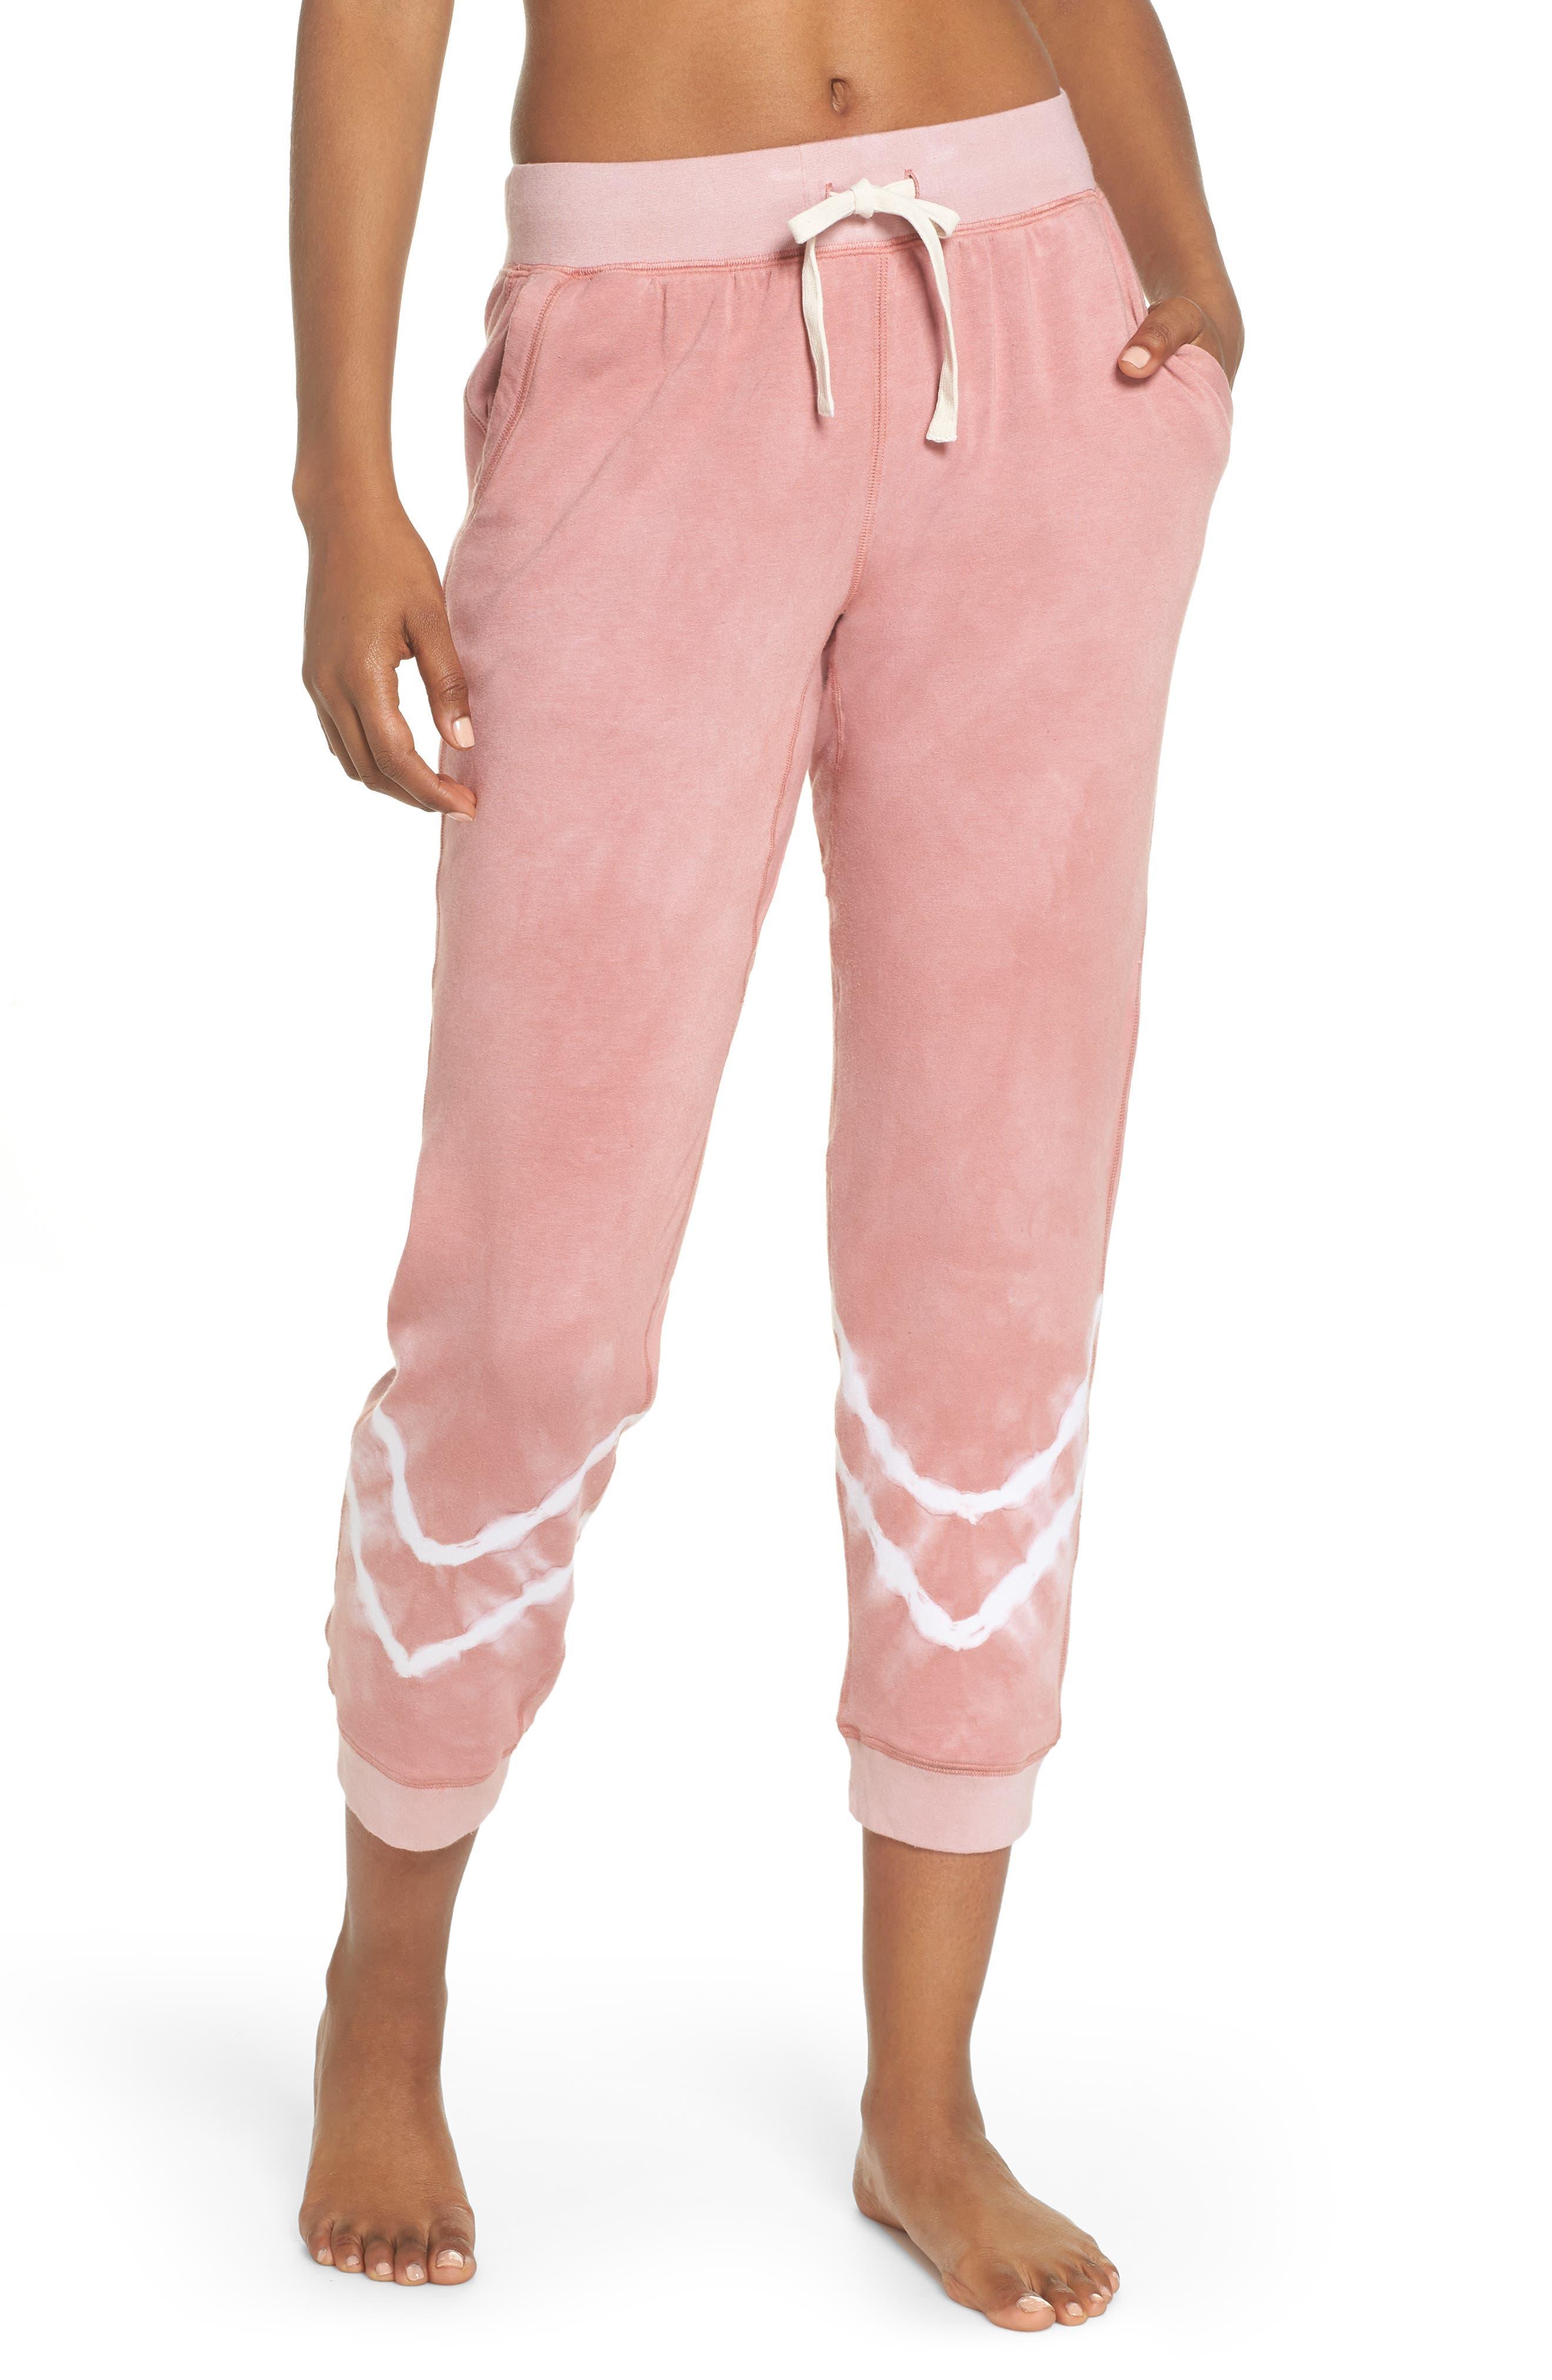 Abbot Kinney Sweatpants,                         Main,                         color, LADY / MOON